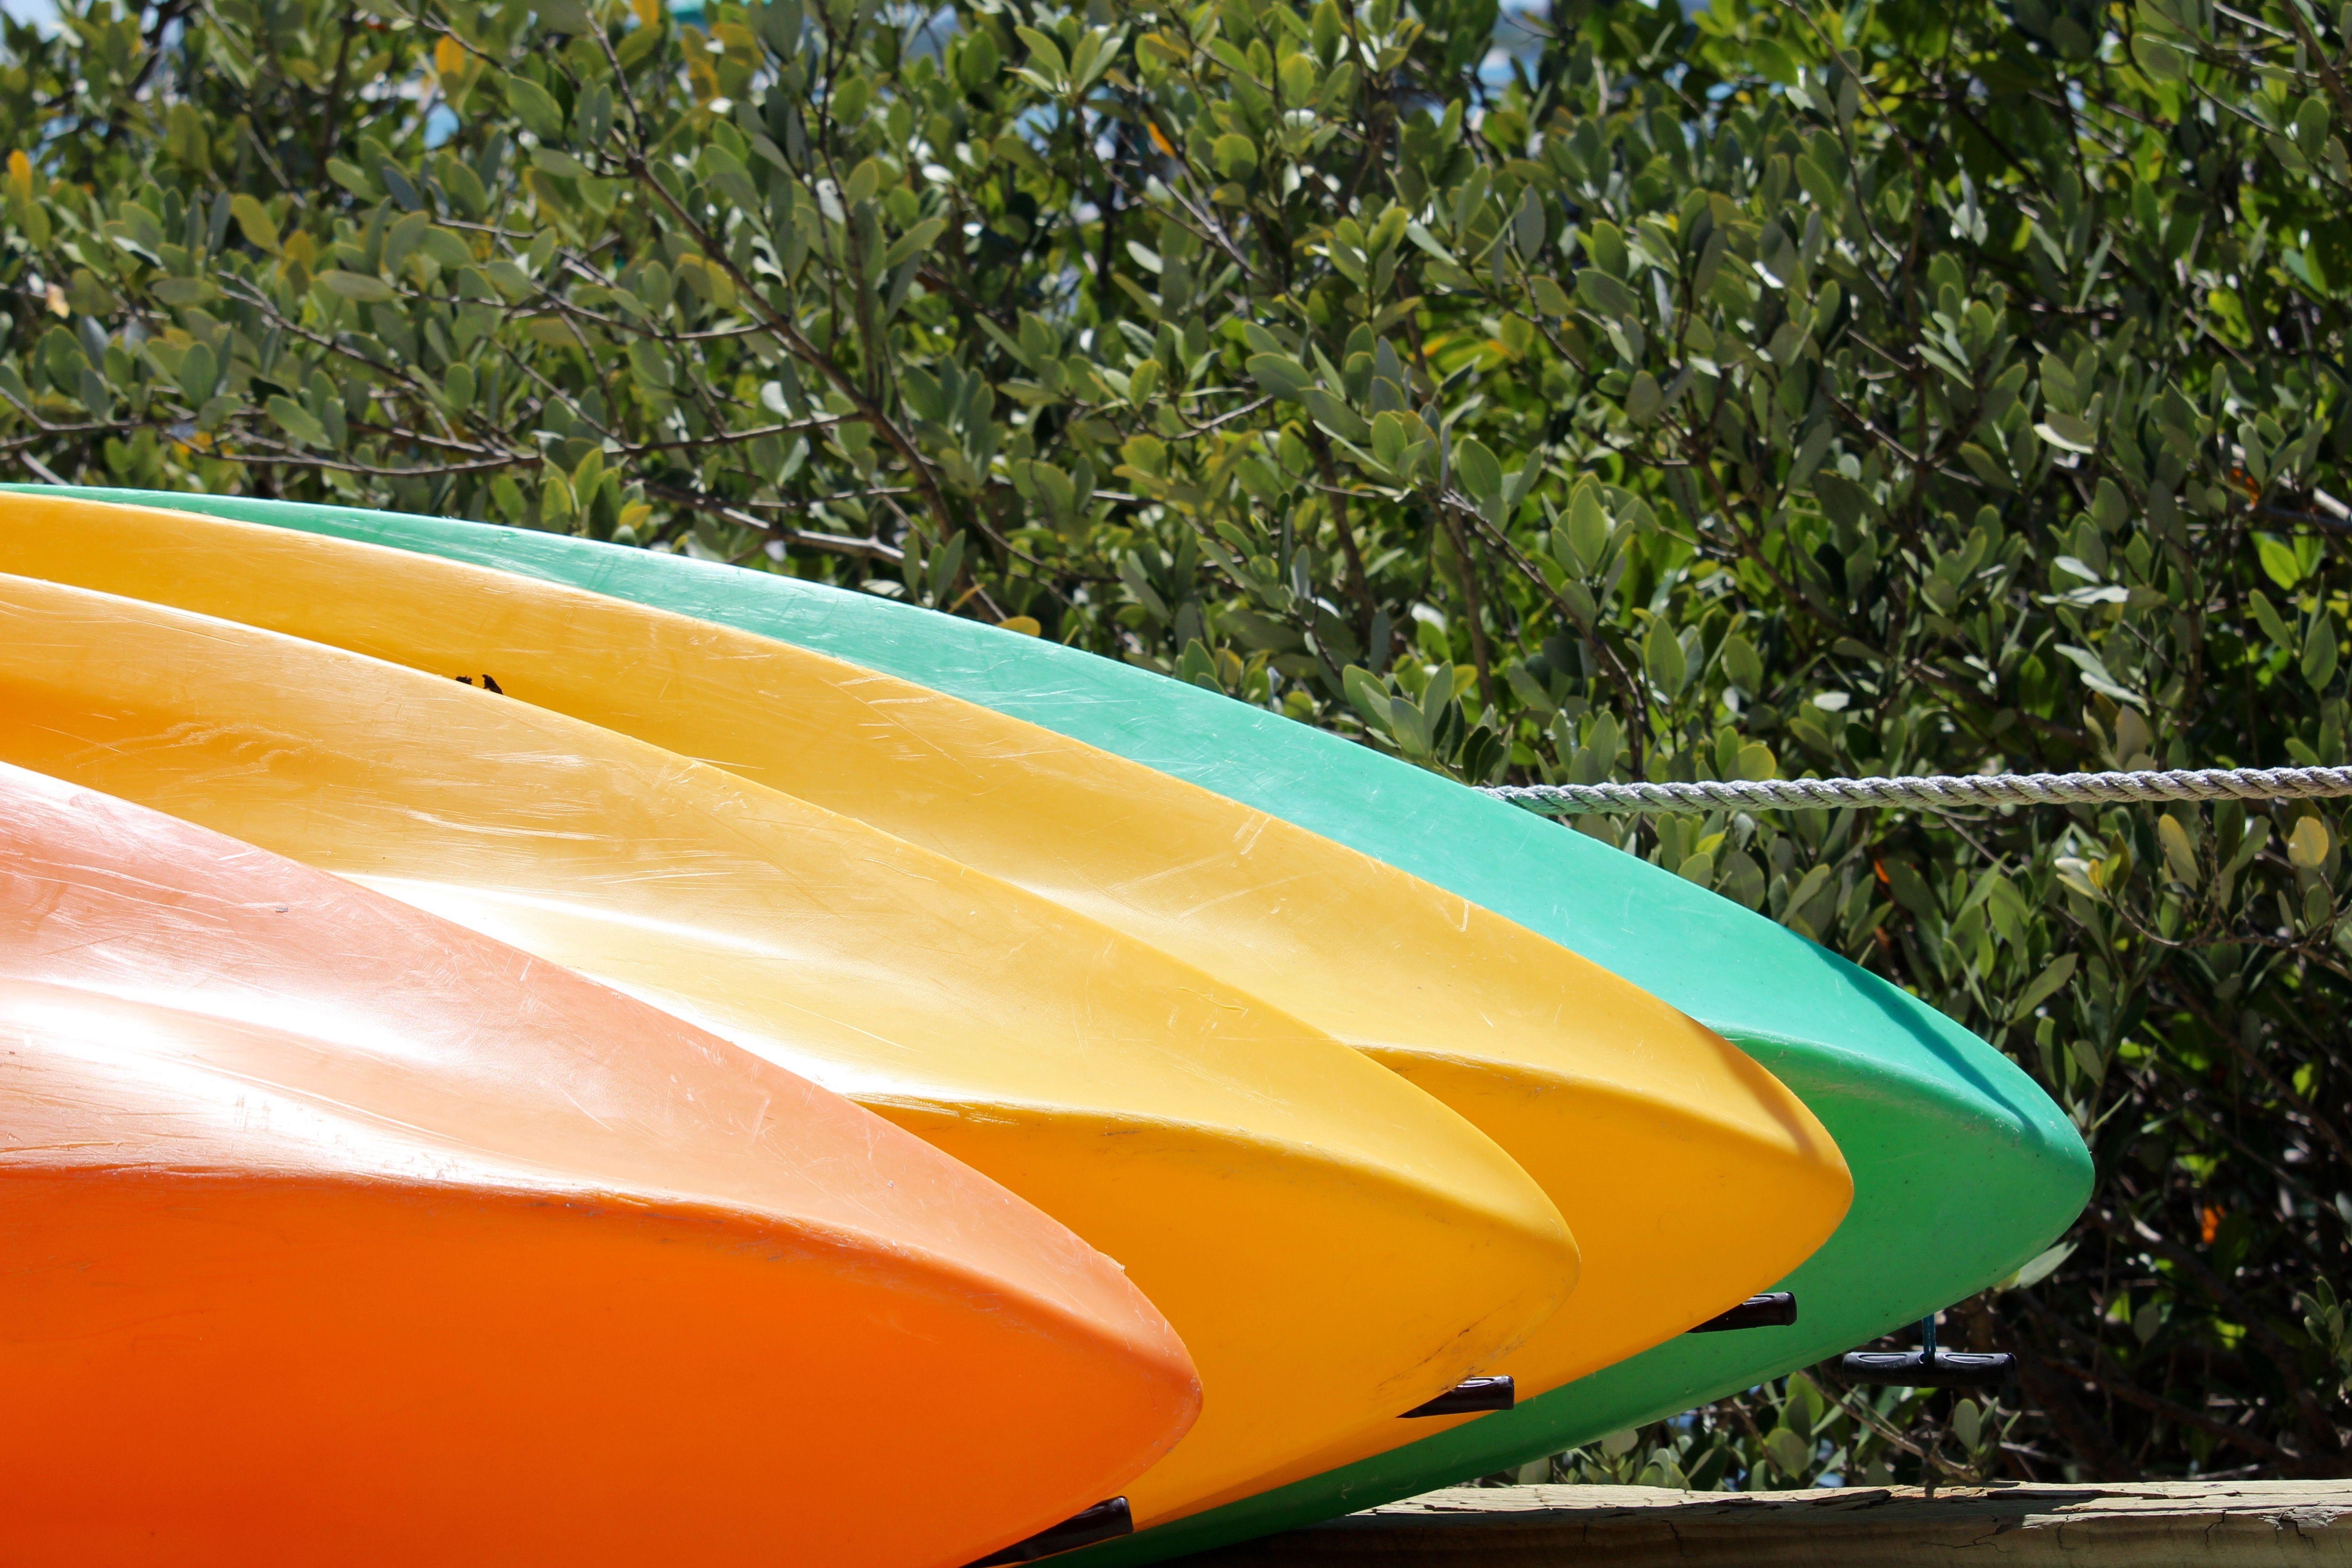 Colorful Kayaks next to Florida mangrove